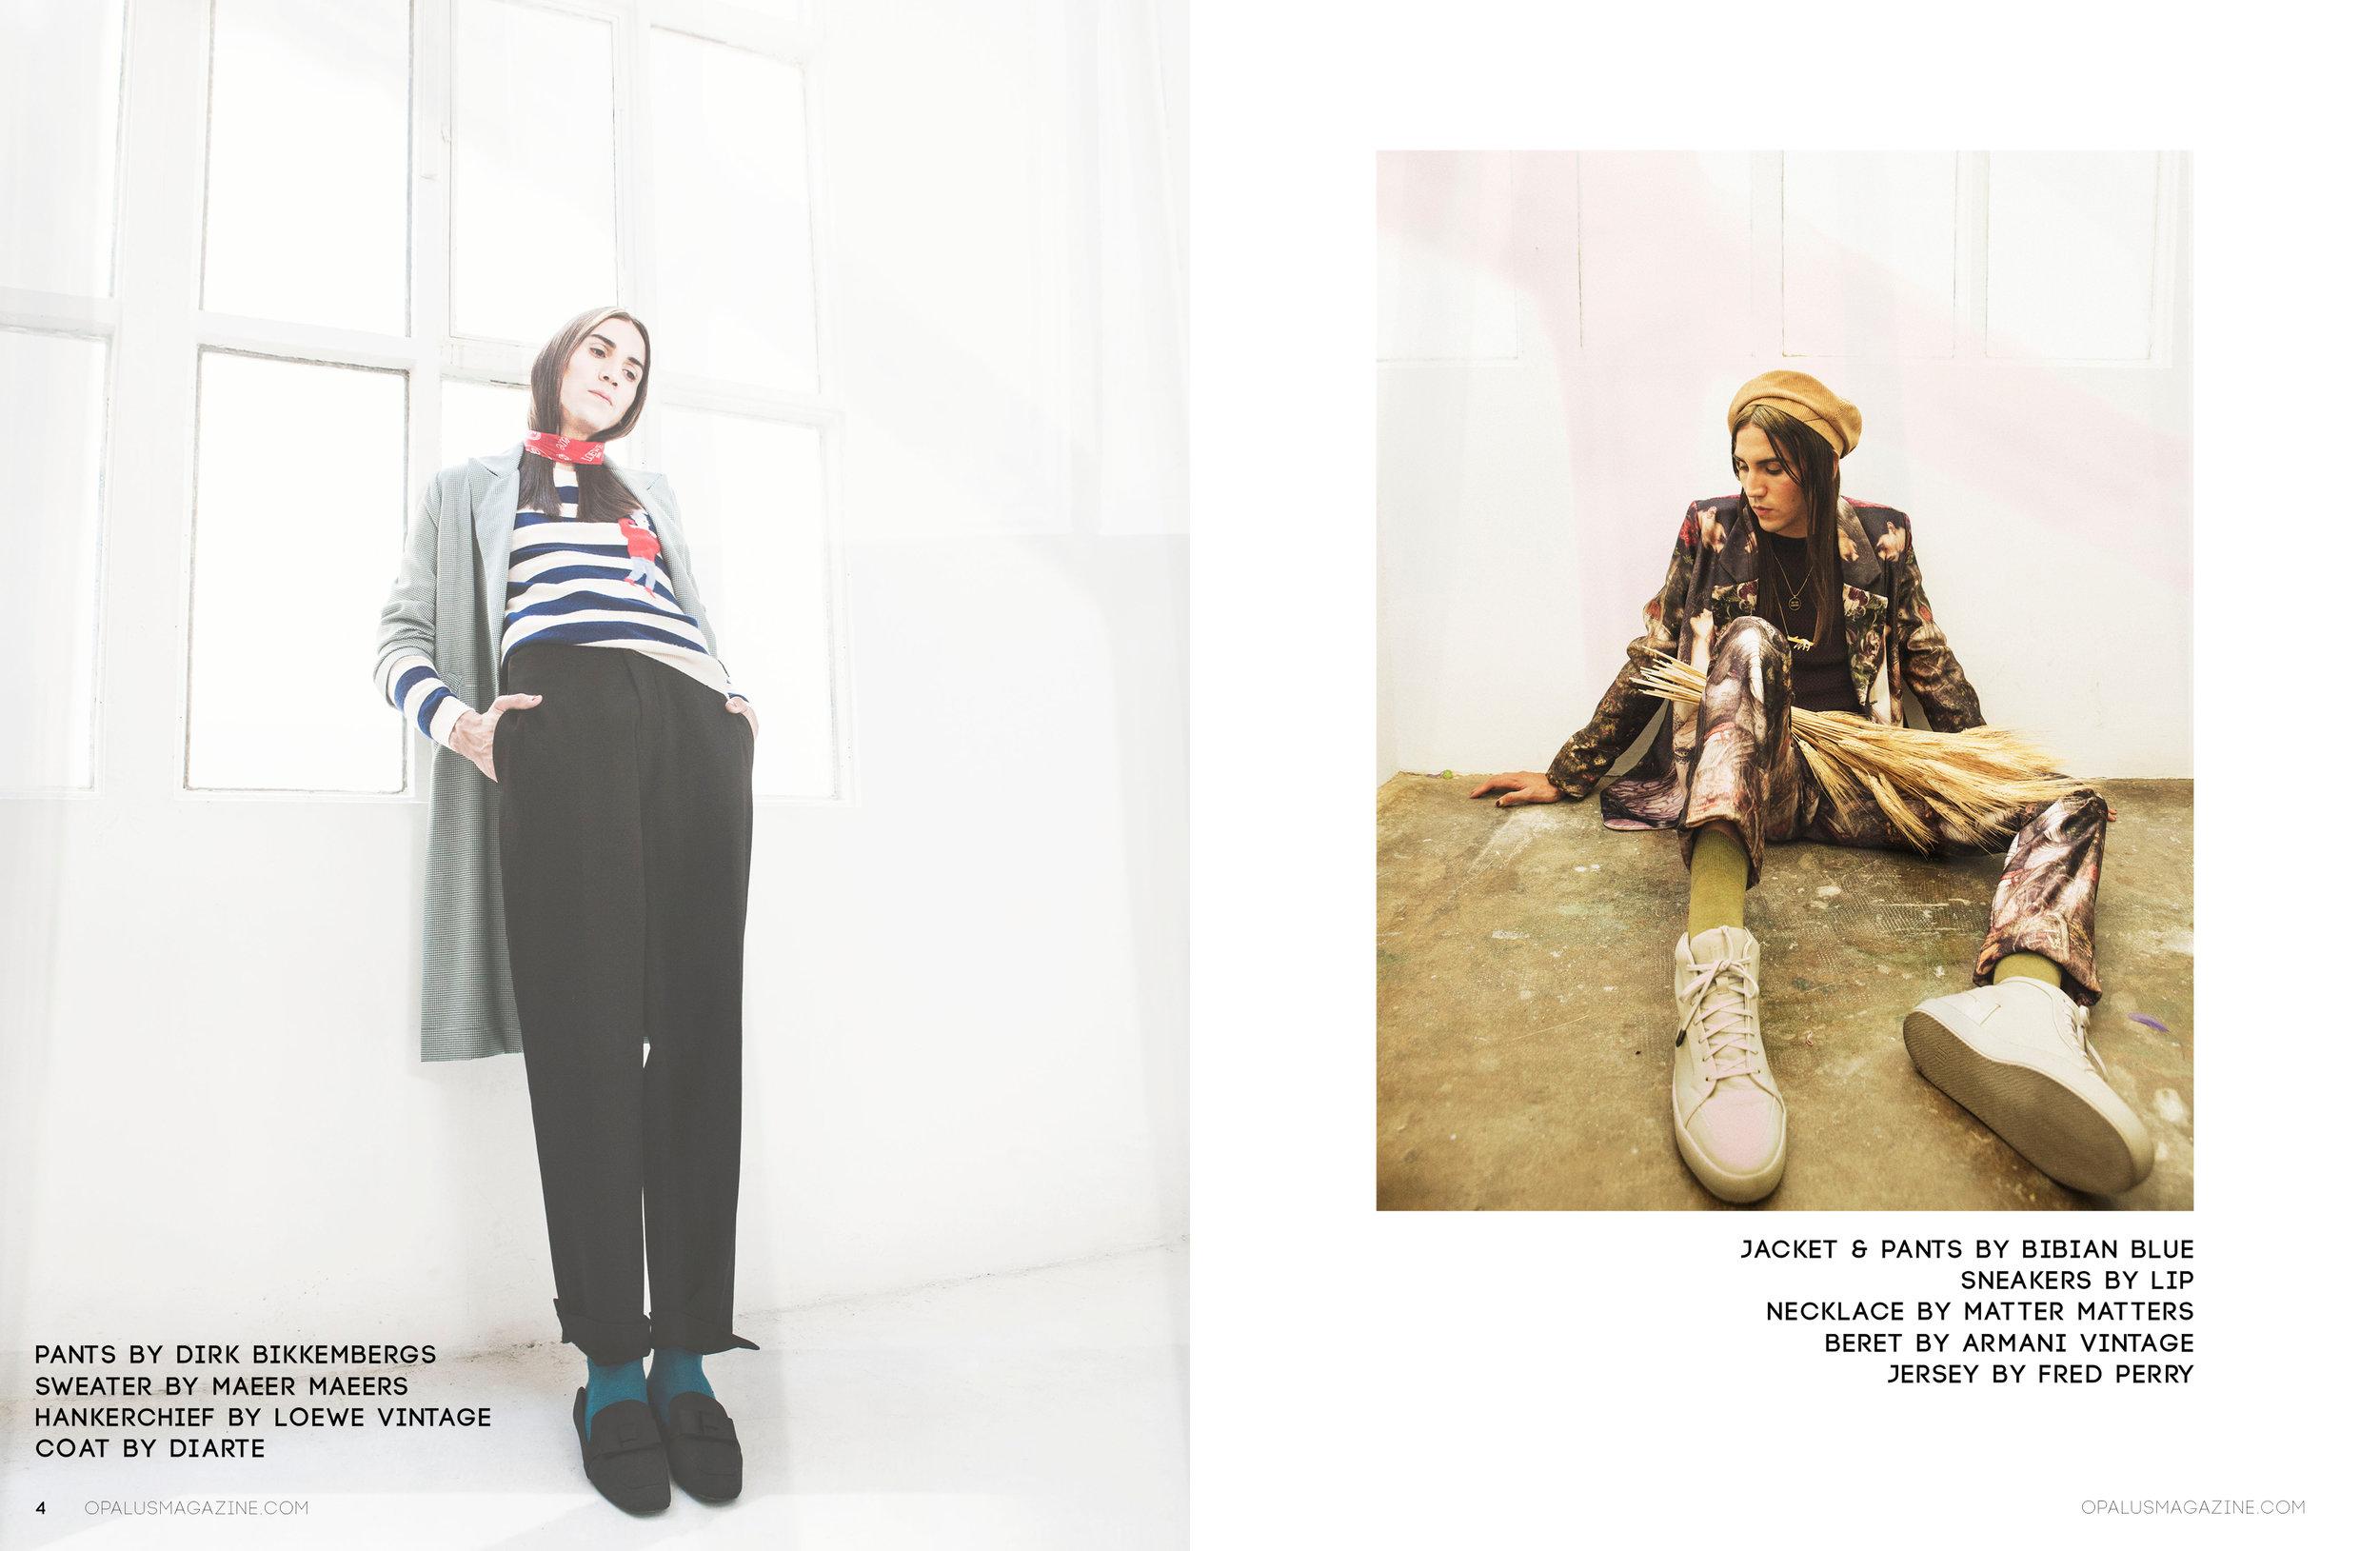 Ana_Coello_OPALUS_Magazine3.jpg